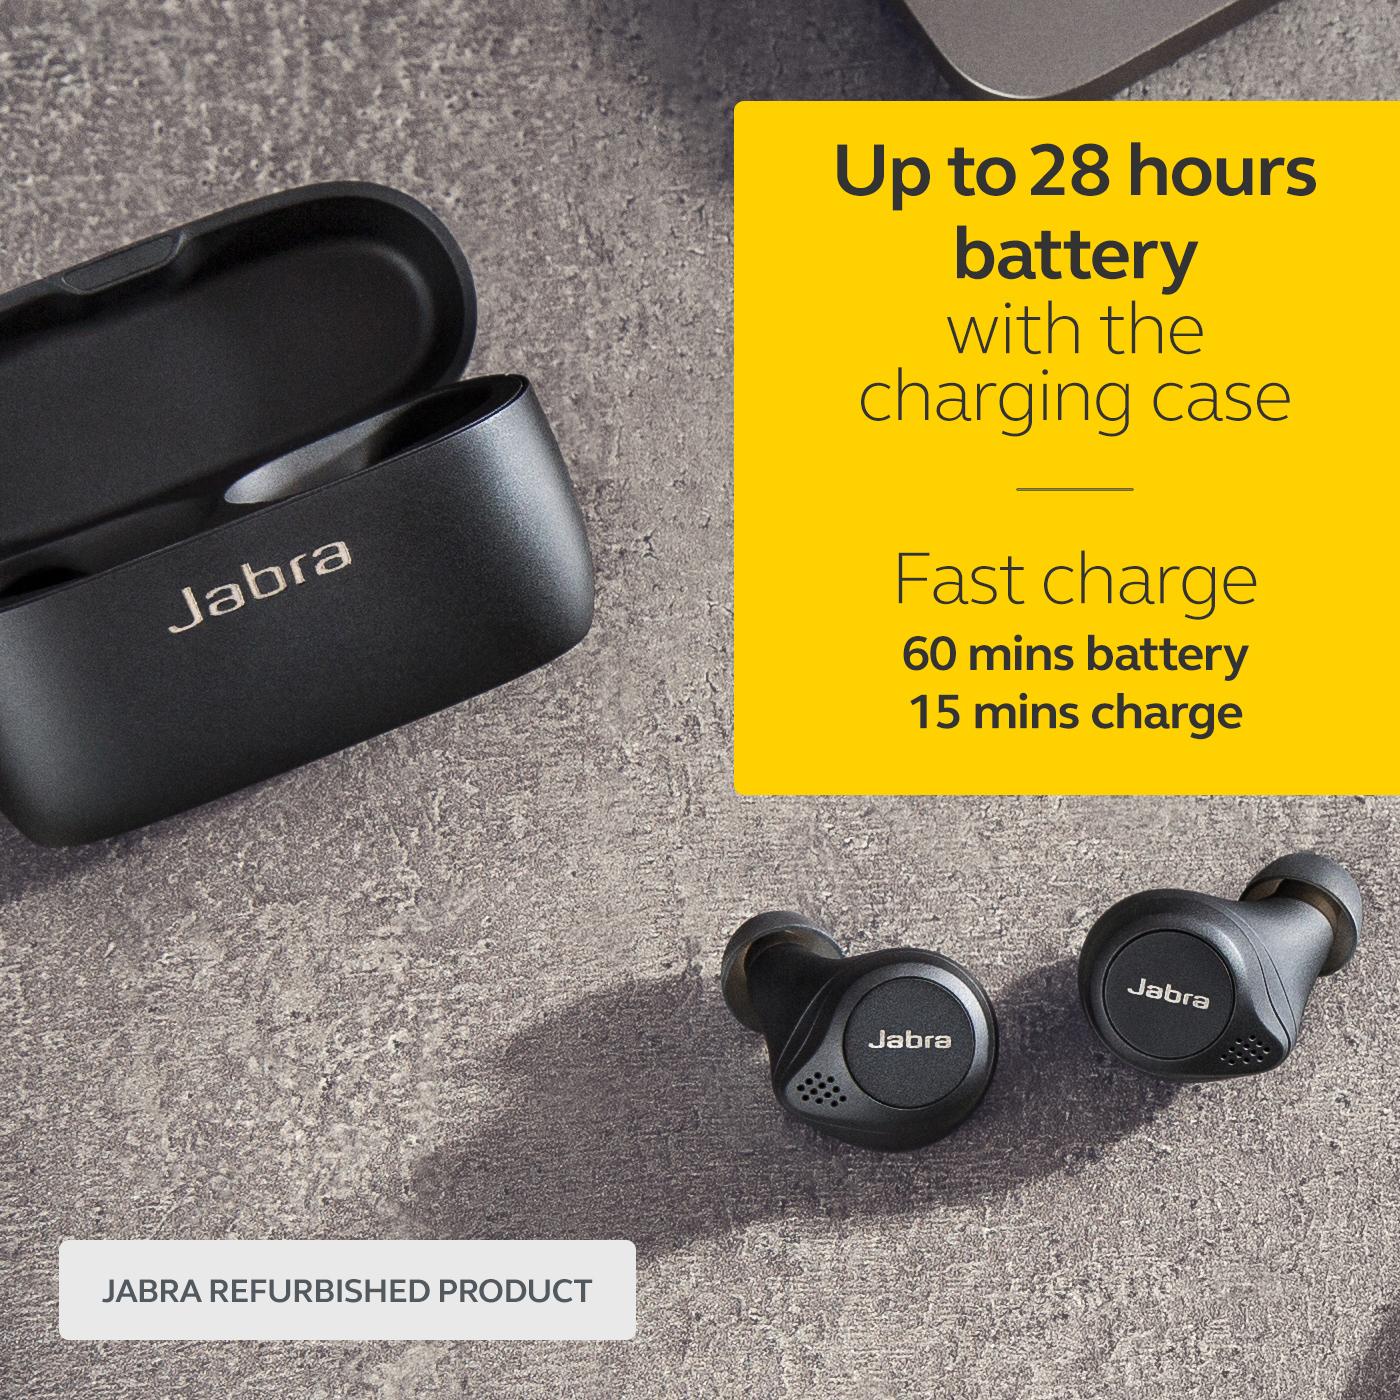 thumbnail 7 - Jabra-Elite-75t-Voice-Assistant-True-Wireless-earbuds-Certified-Refurbished